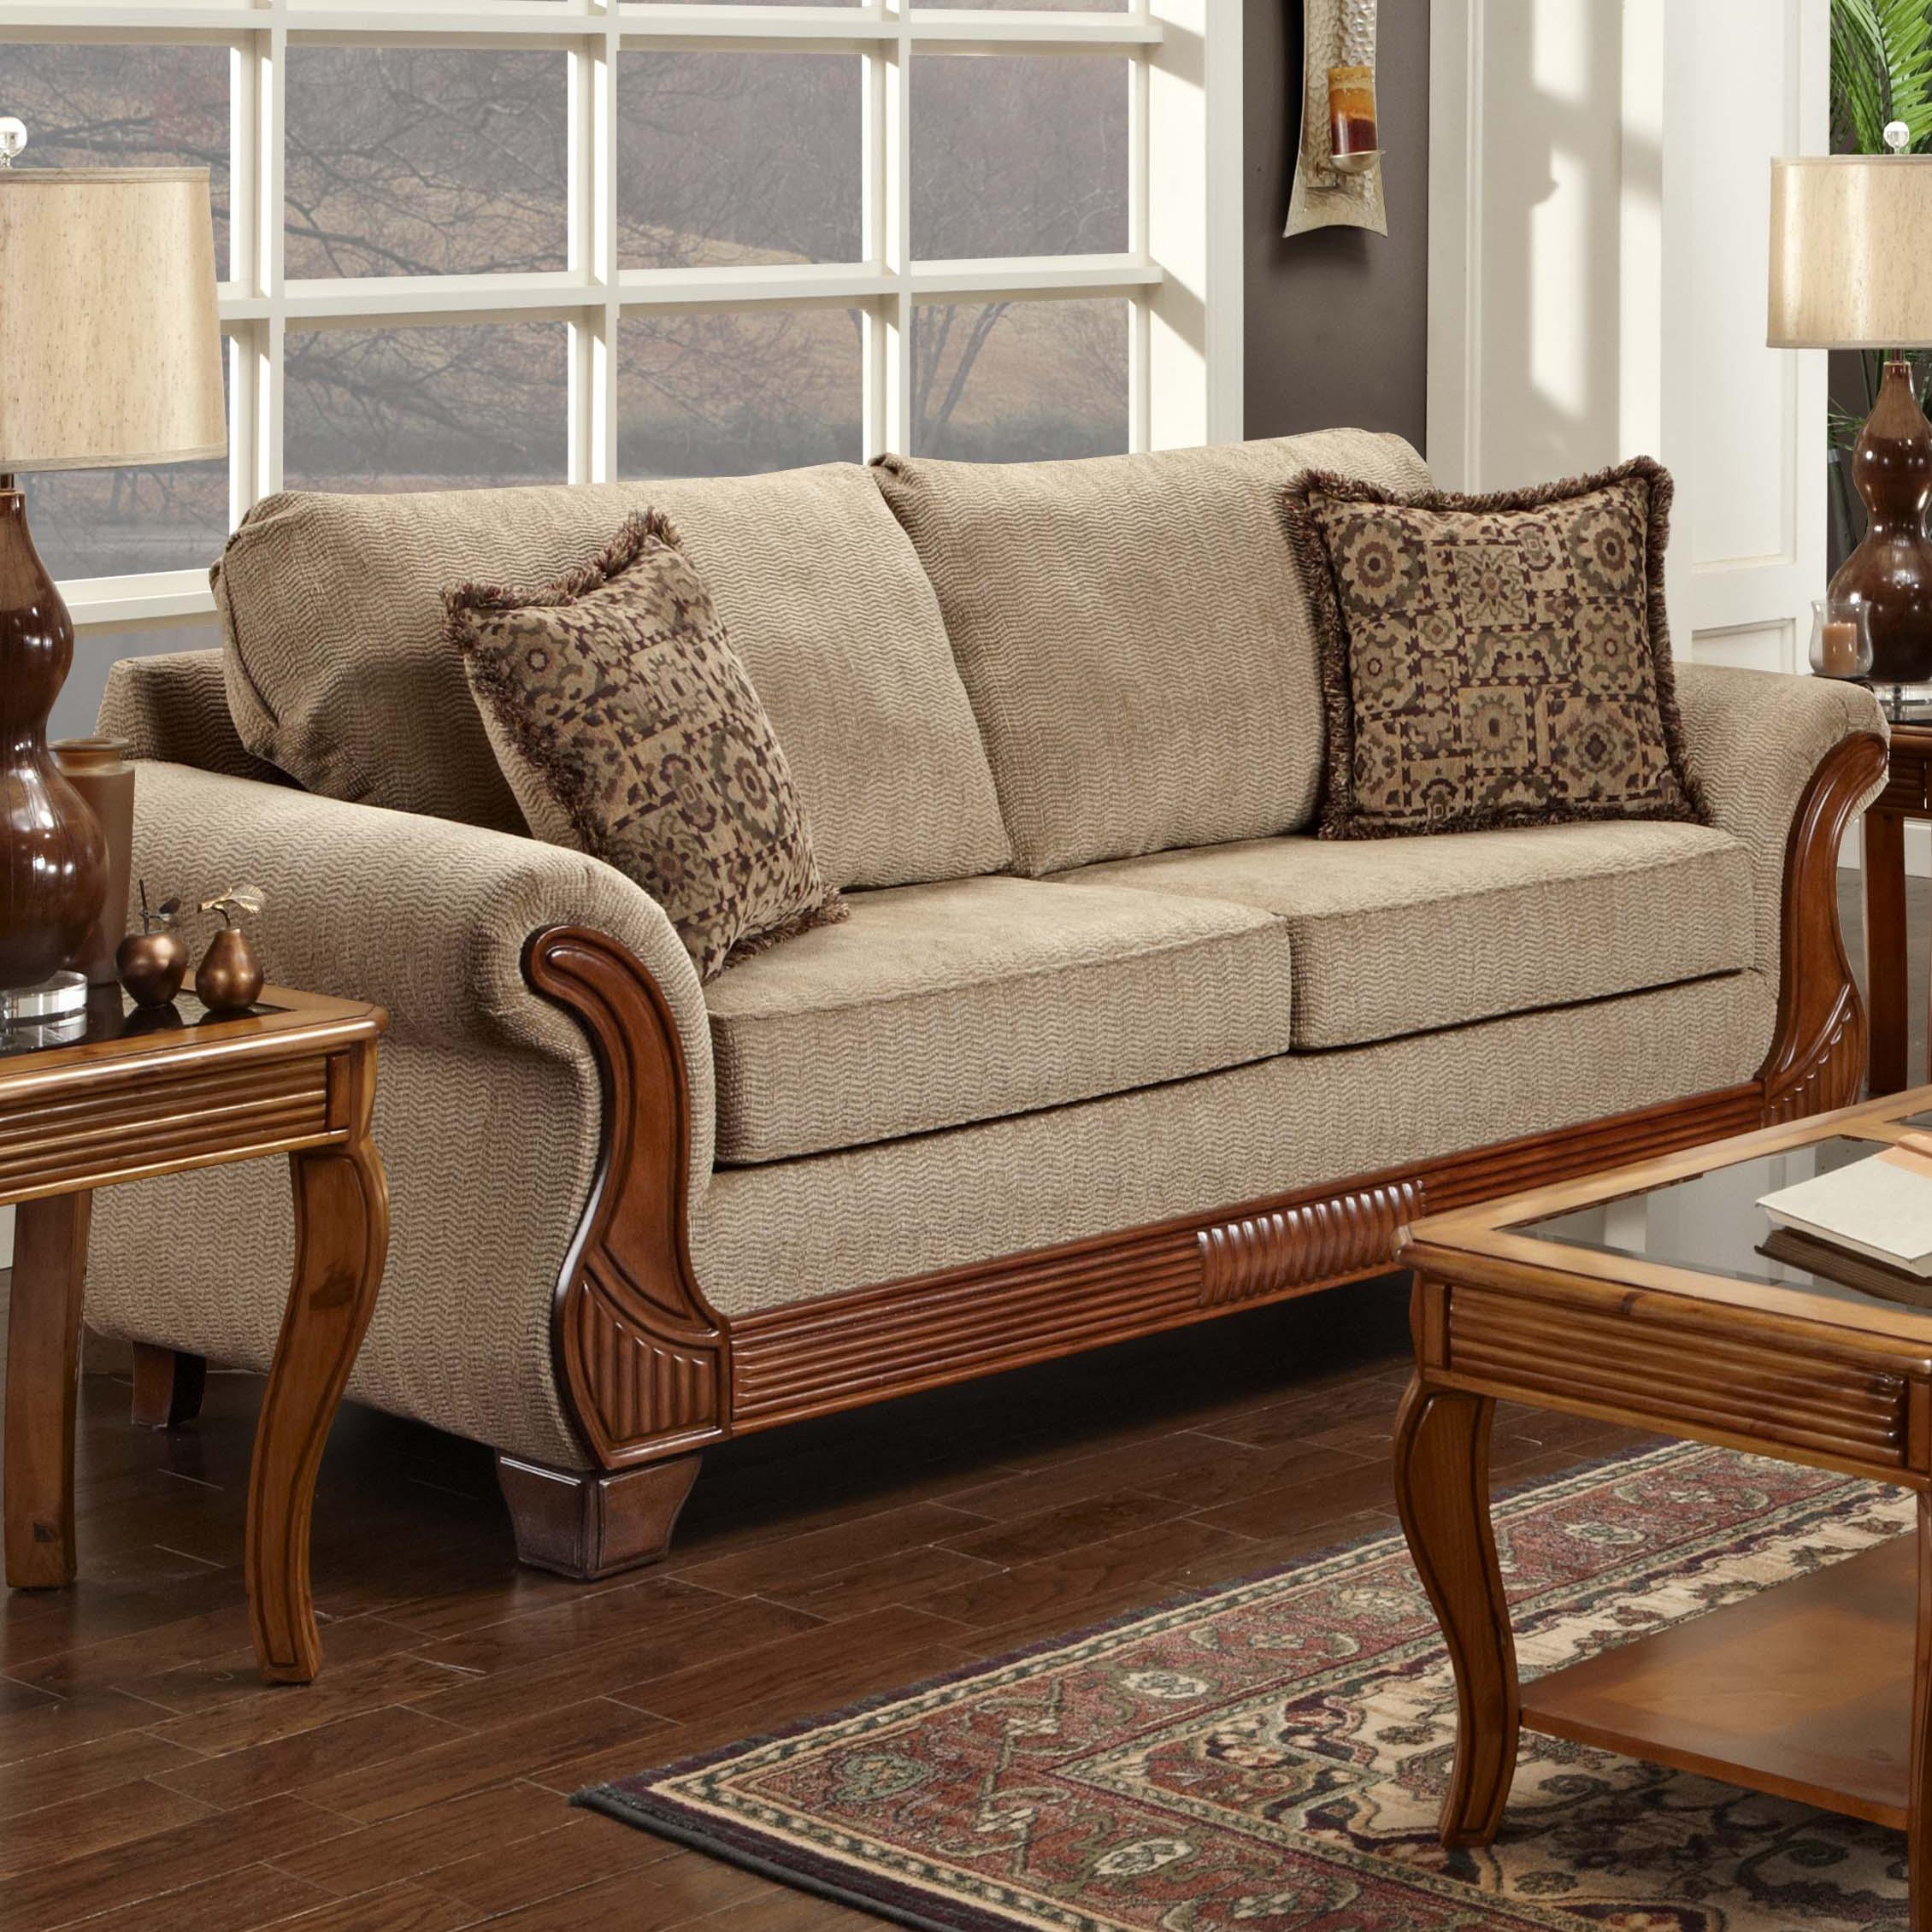 7000 Stationary Sofa by Washington Furniture at Lynn's Furniture & Mattress